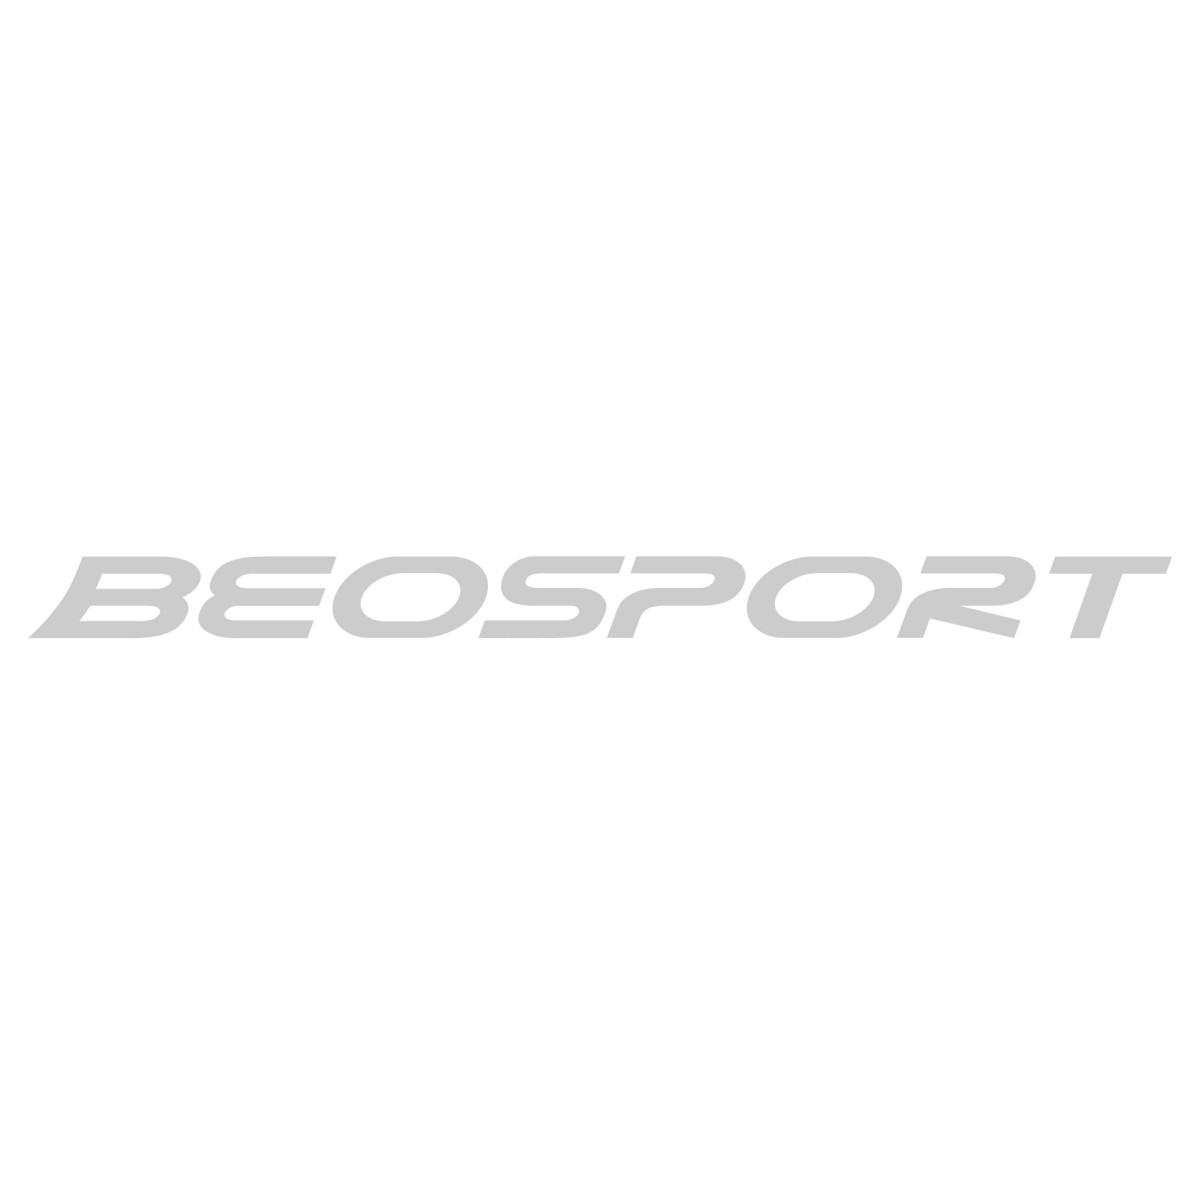 The North Face Recycled Pom Pom kapa